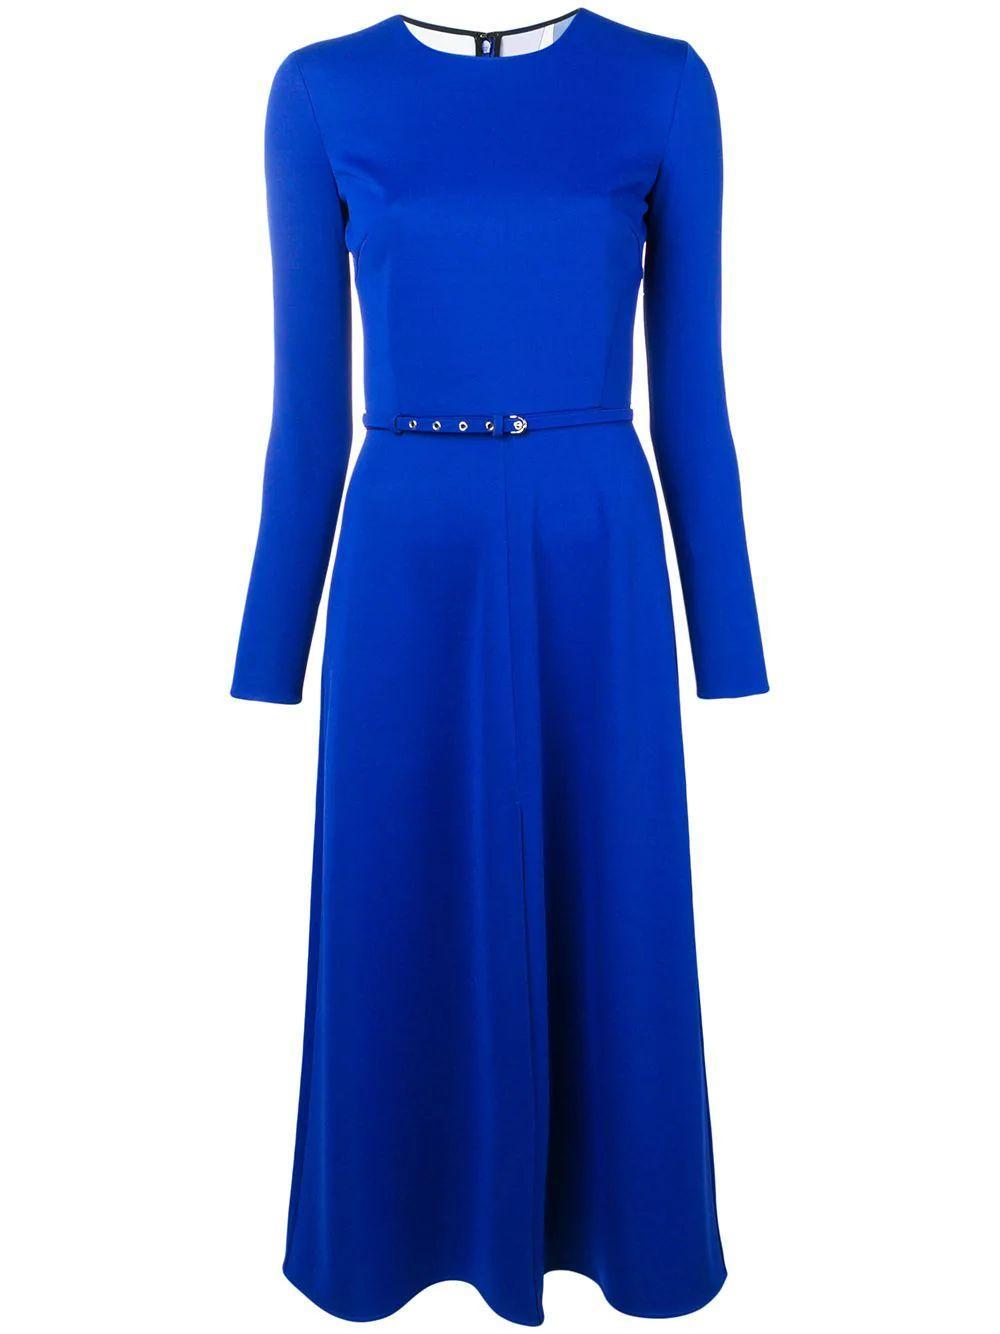 Long Sleeve Midi Dress With Front Slit Item # 9UJH91-9U631